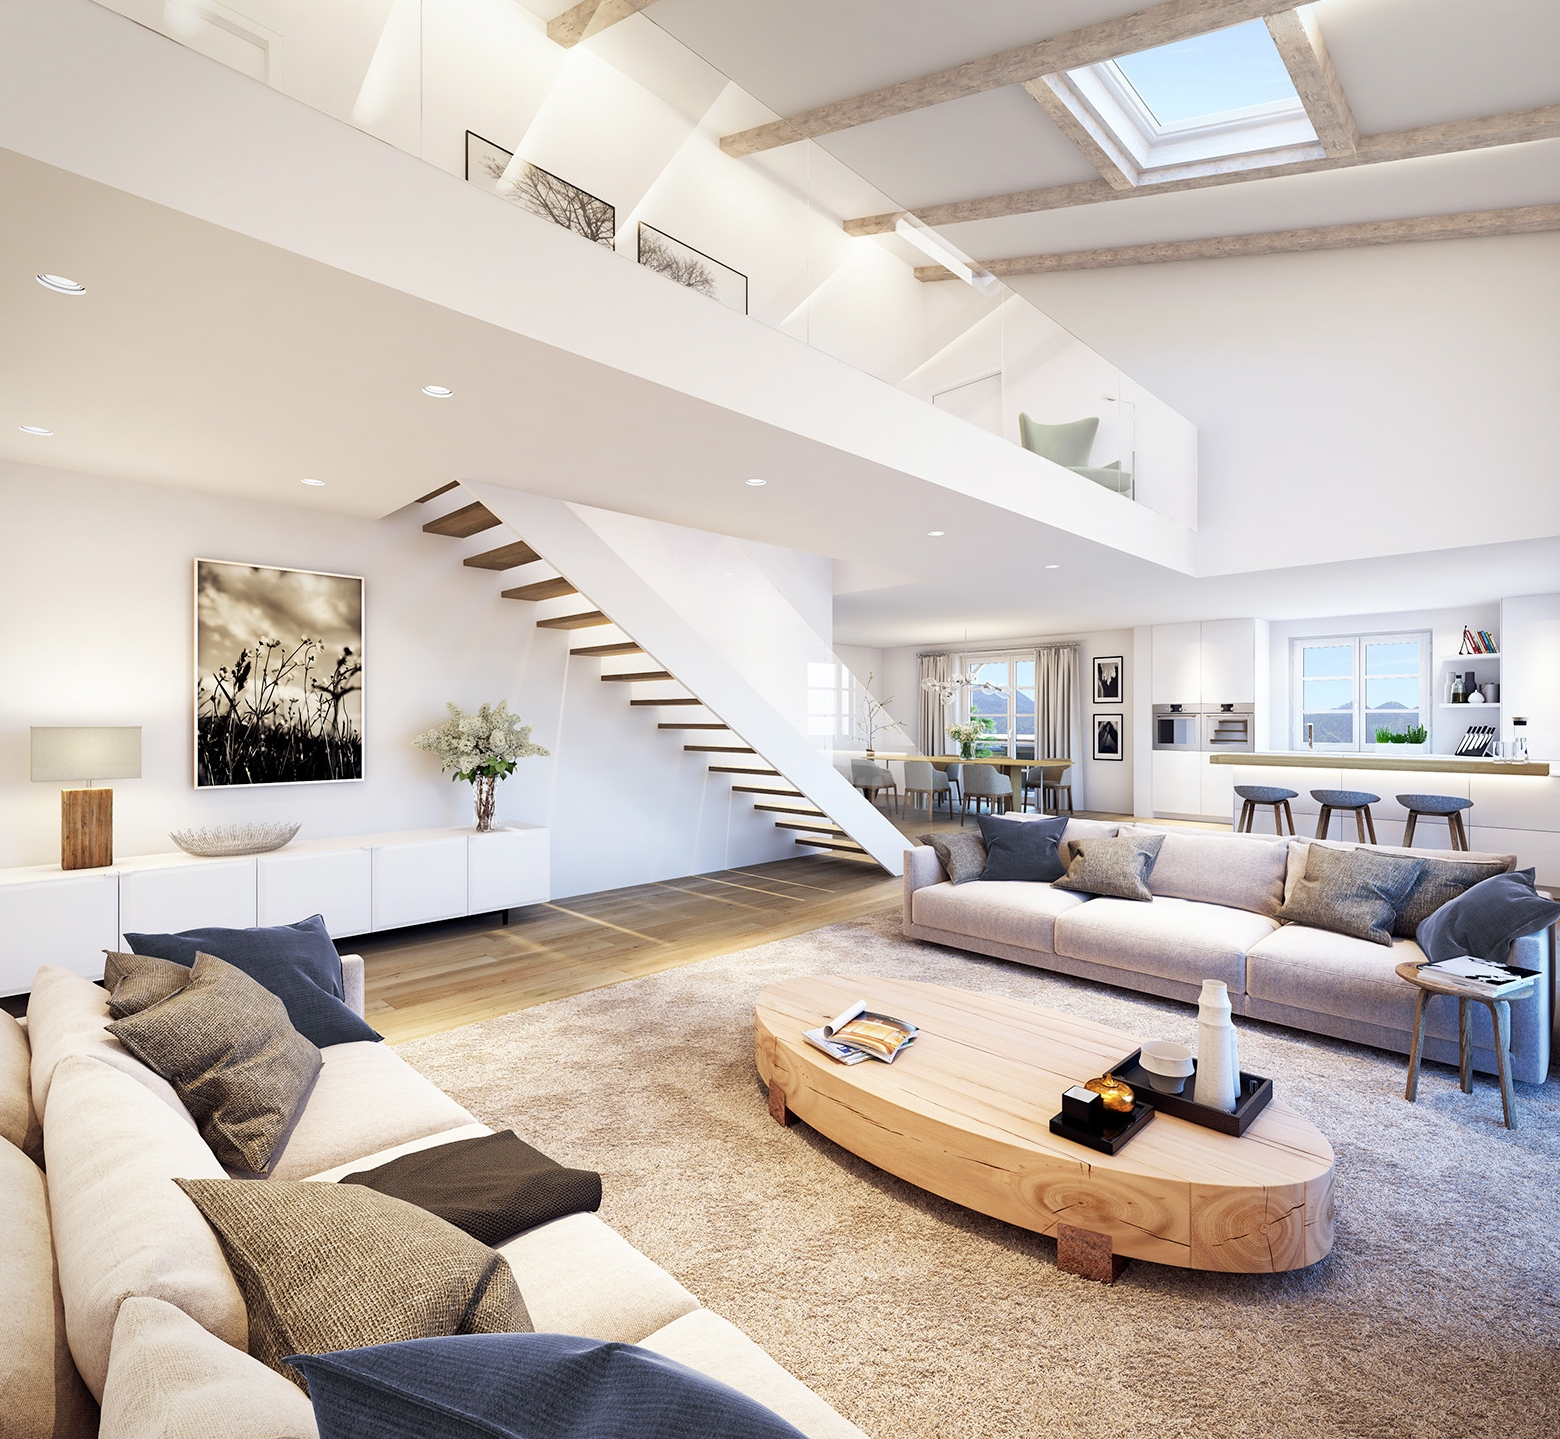 quartier-tegernsee-interior-penthouse-neureuth.jpg